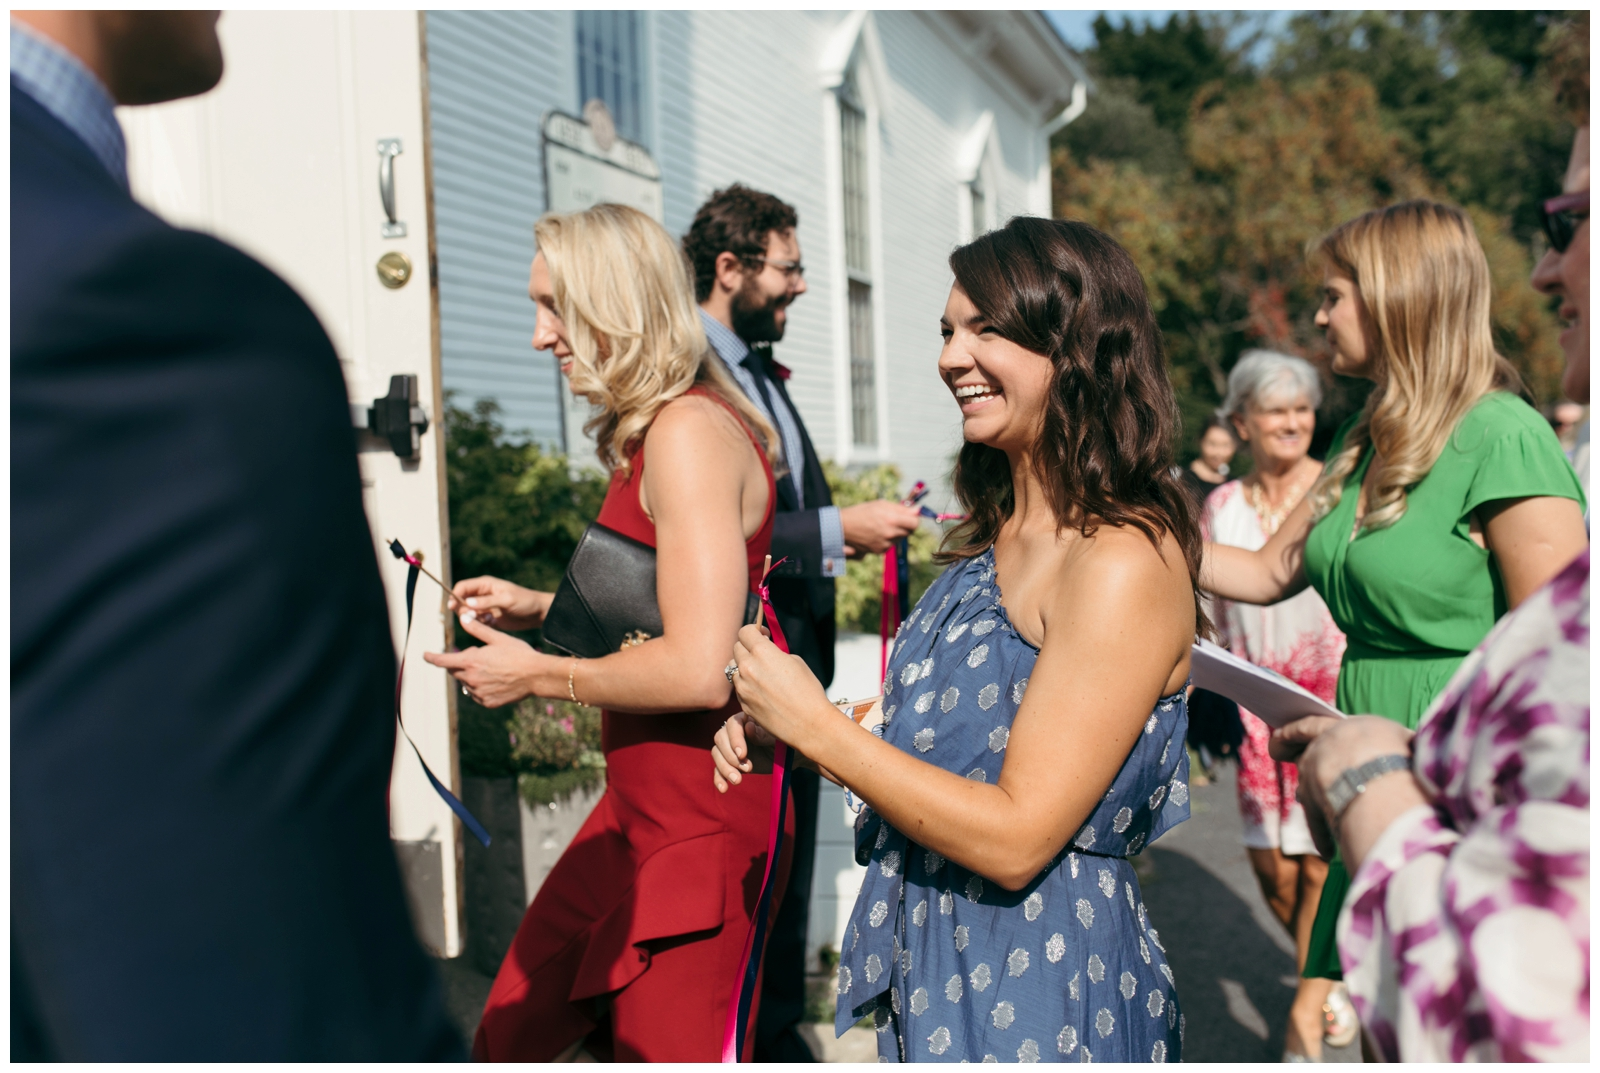 Bailey-Q-Photo-Backyard-Wedding-South-Shore-Boston-Wedding-Photographer-031.jpg